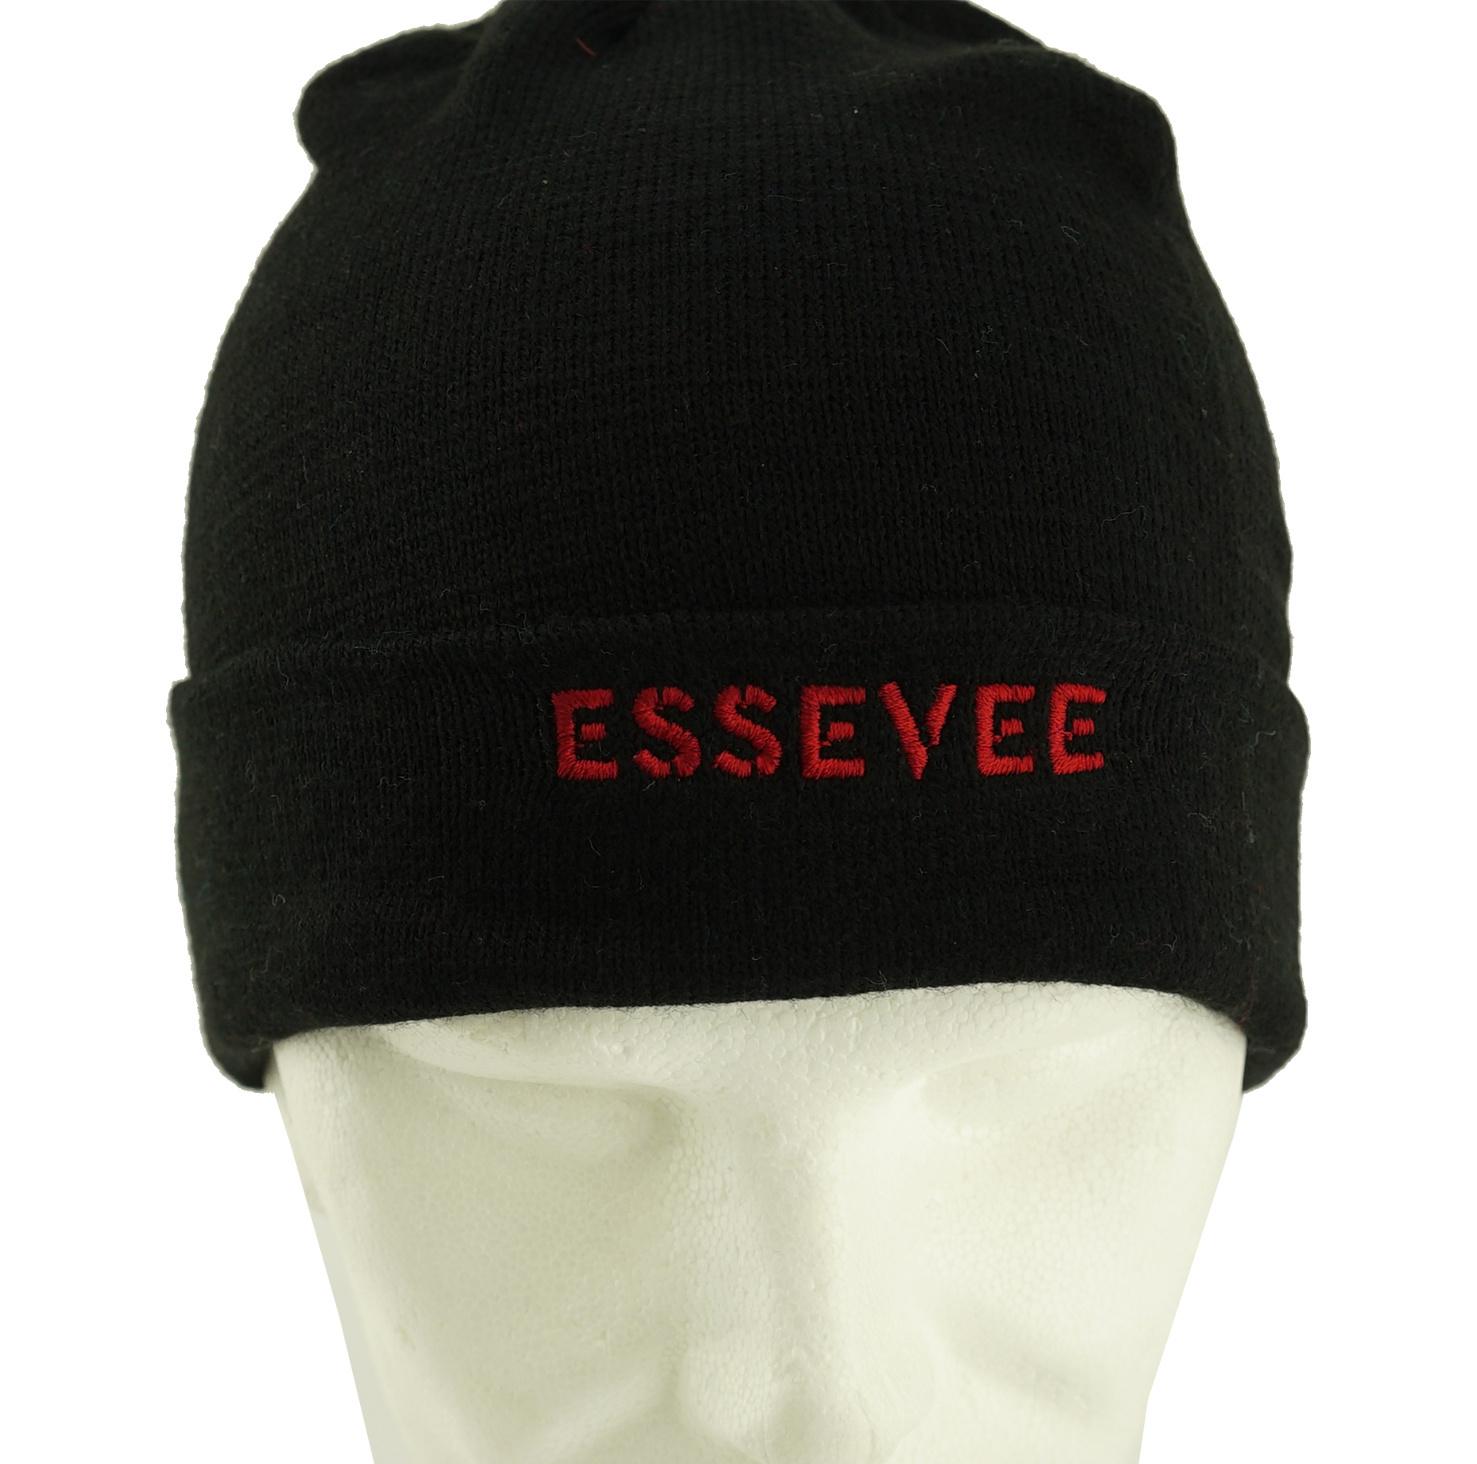 Topfanz Black beanie Essevee